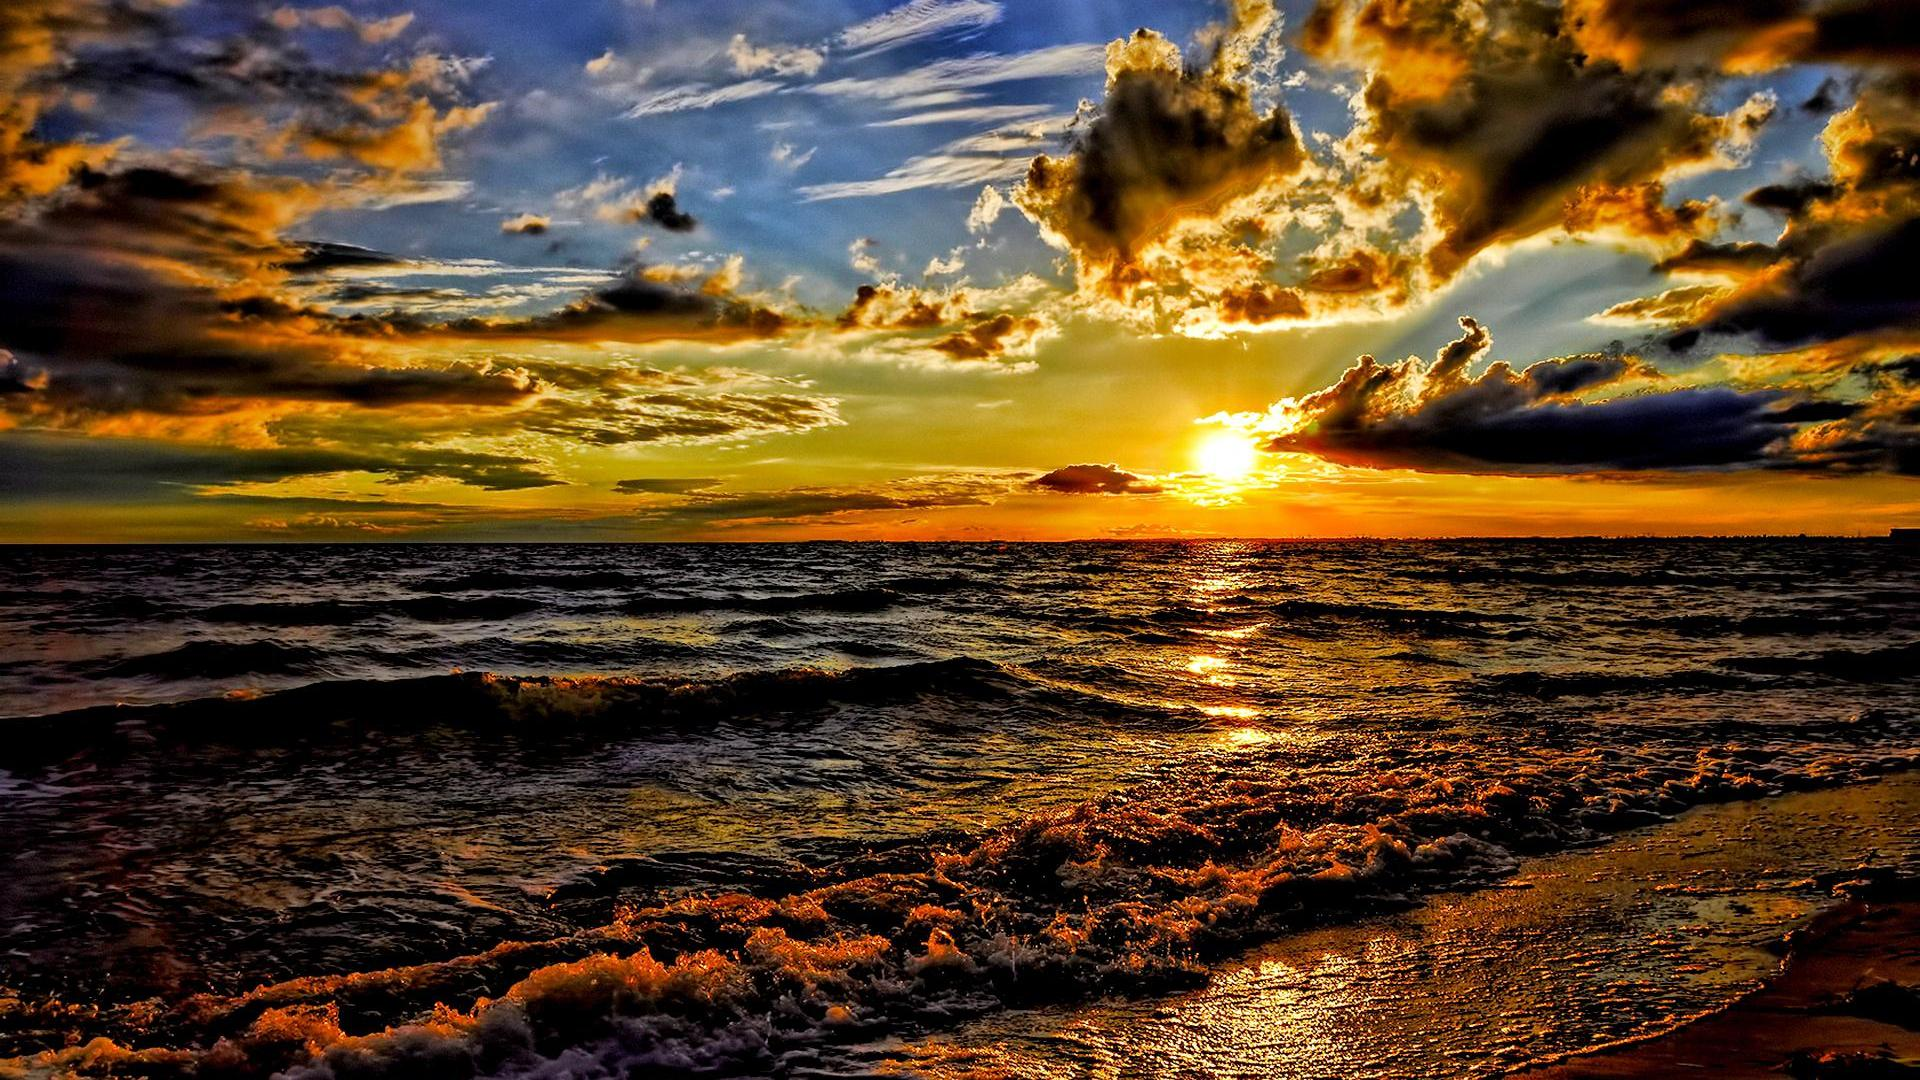 pics photos ocean sunrise hd wallpaper background ocean